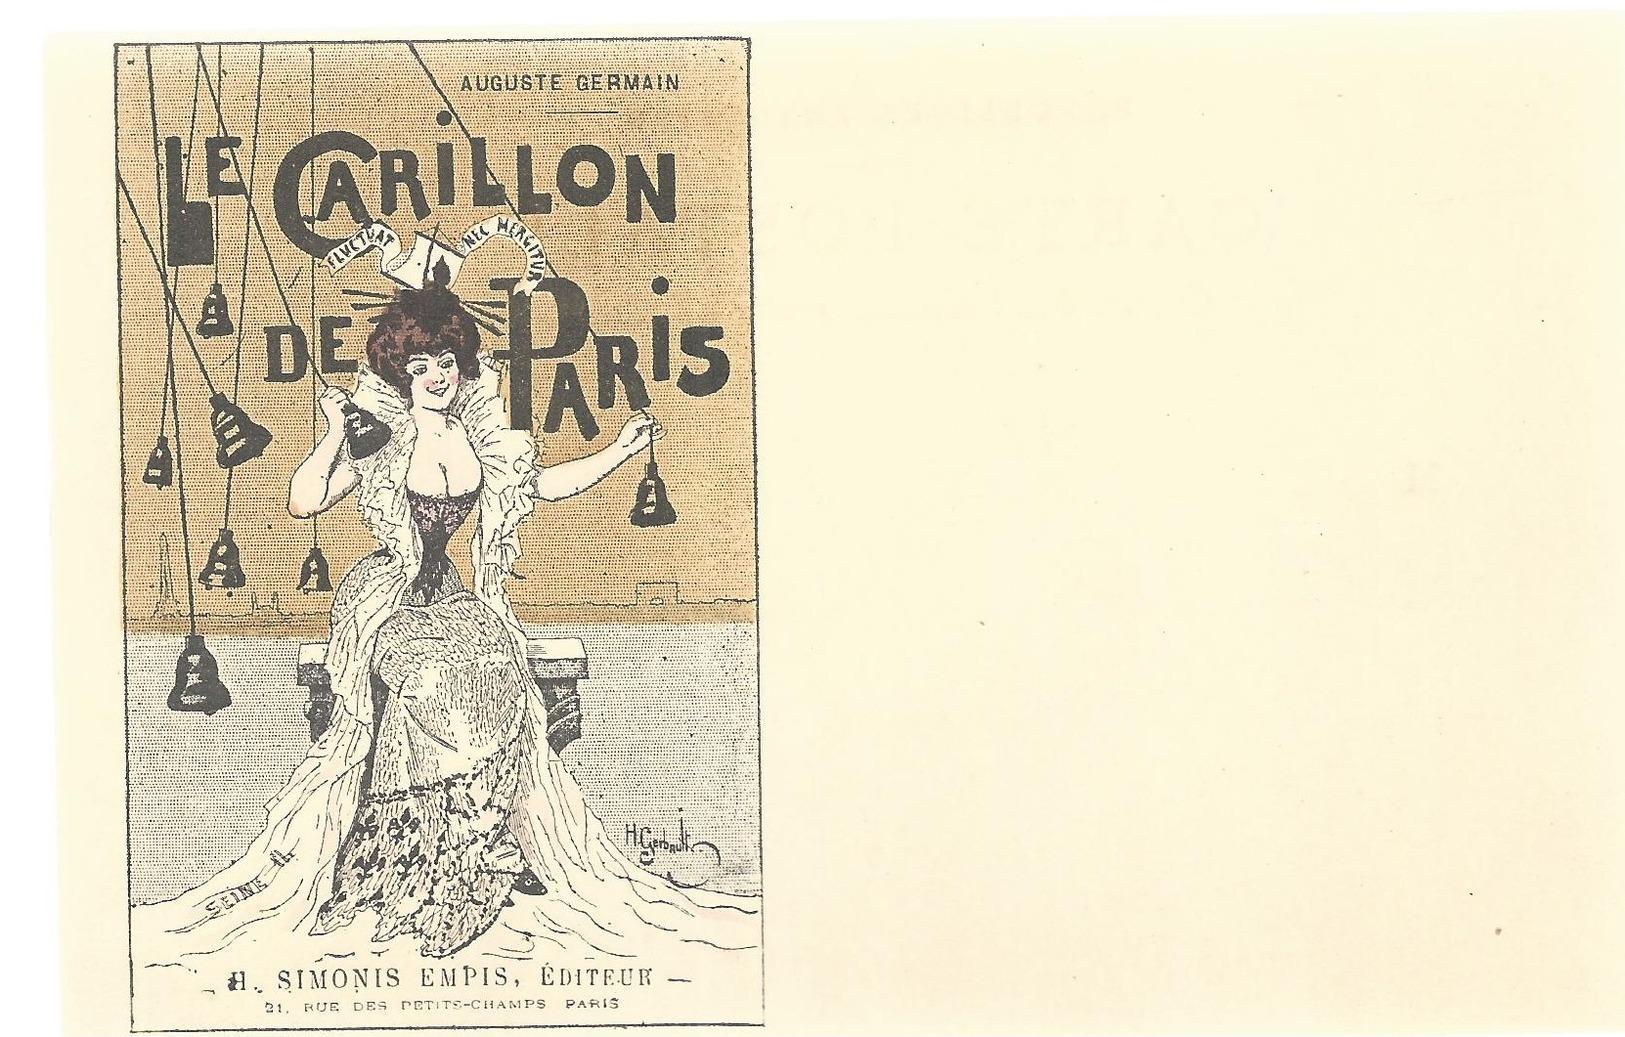 CPA - SERIE SIMONIS EMPIS - LE CARILLON DE PARIS - NON ECRITE - TBE - Illustrateurs & Photographes